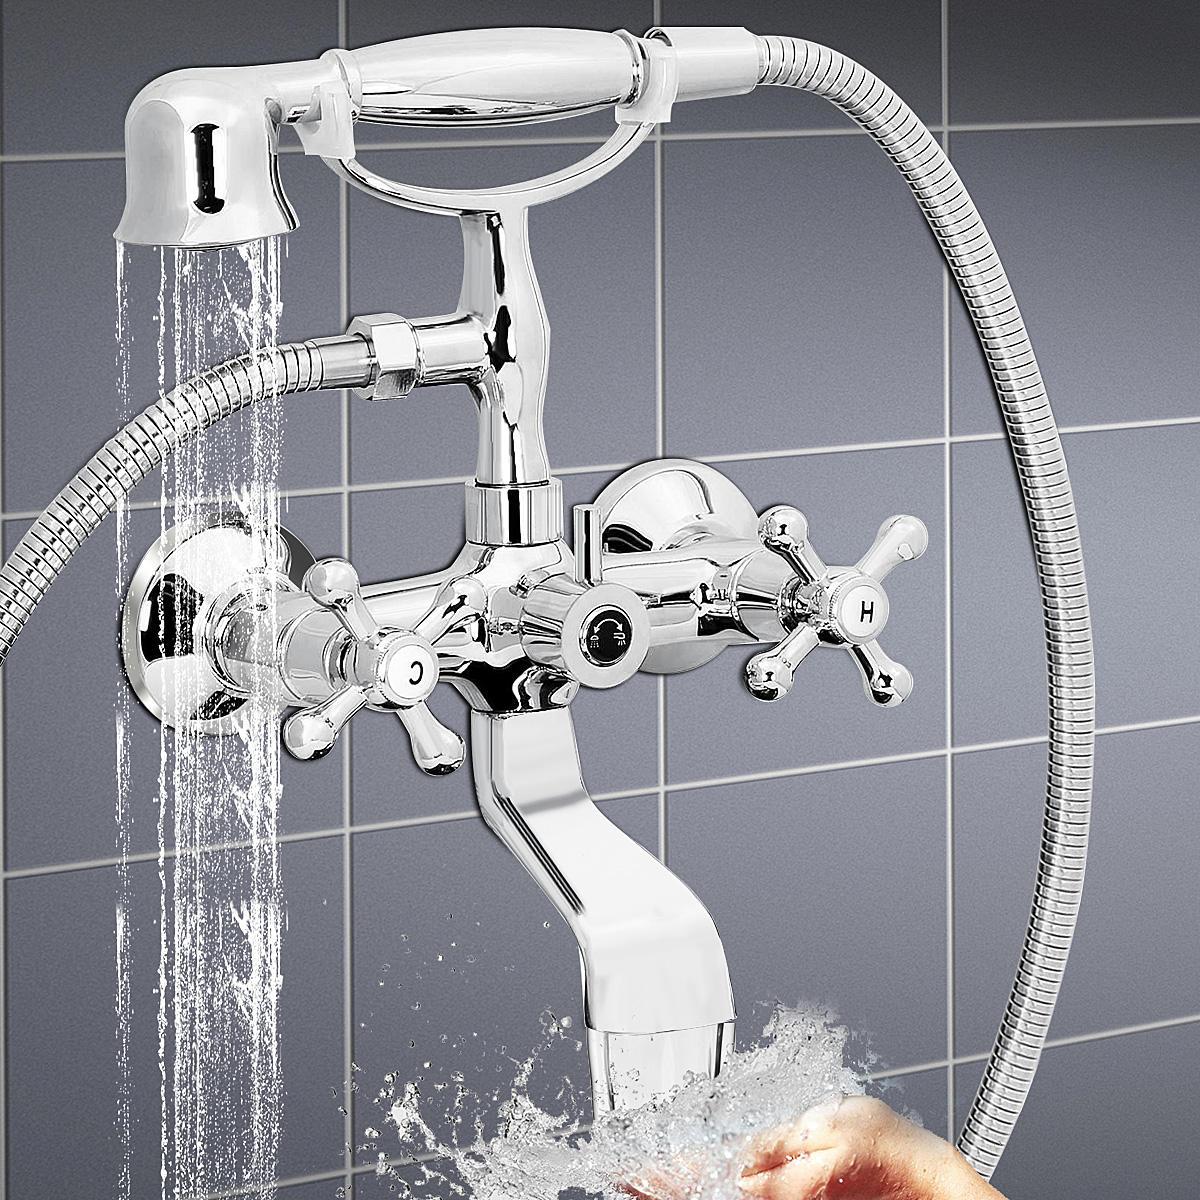 Polished Chrome Clawfoot Bathtub Tub Faucet With Hand Shower Head Spray Wall Mount Sets